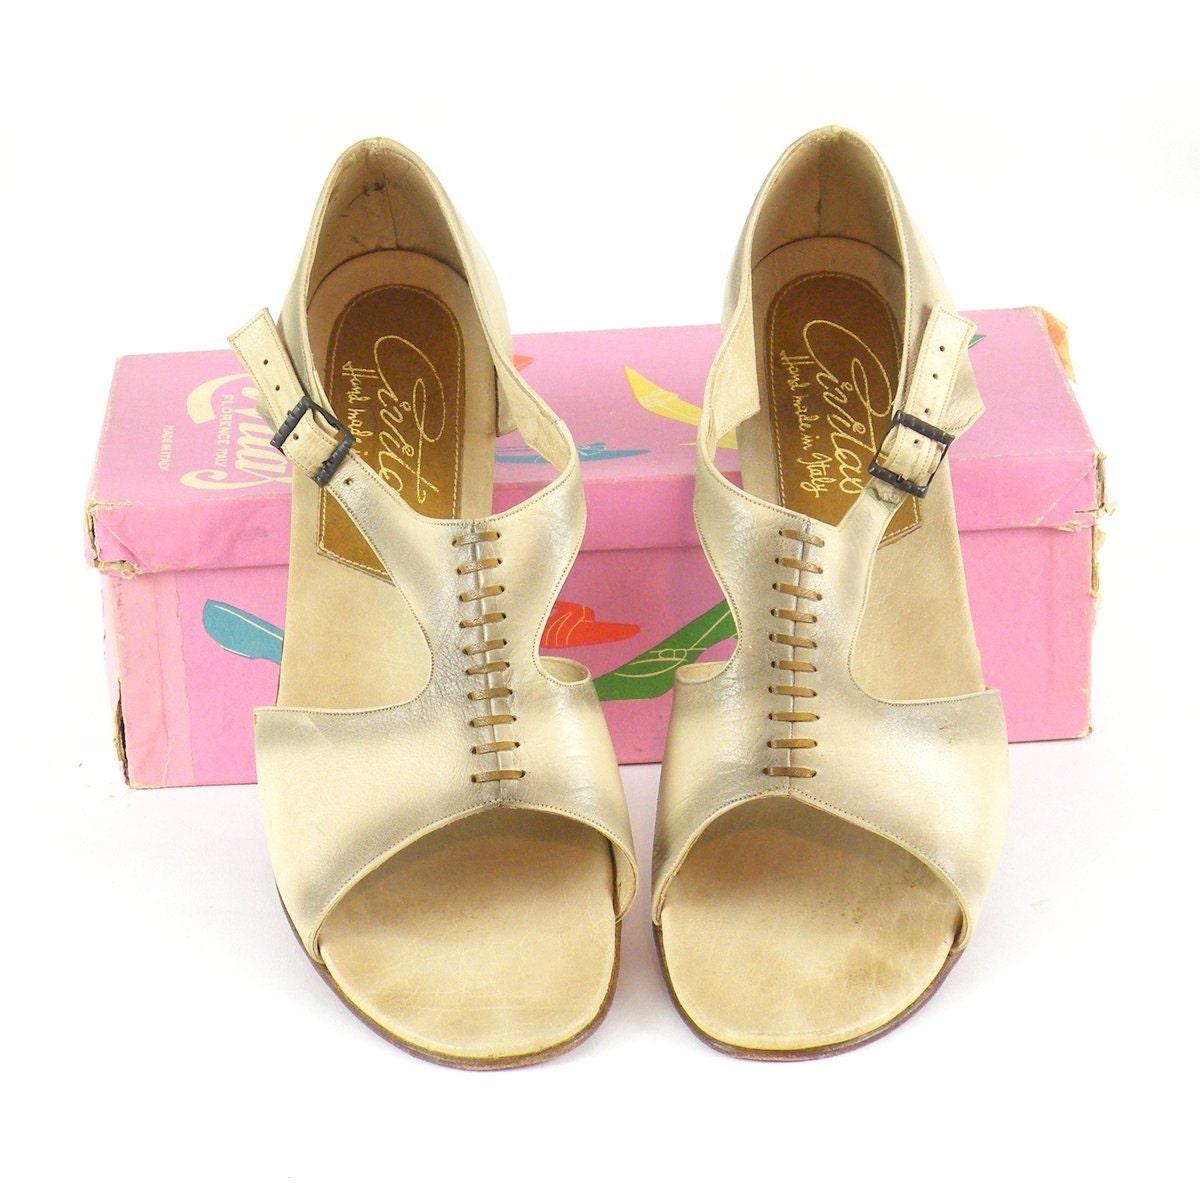 12 SandalsDeadstock Civitas Size 1970s Vintage 70s Flats Leather N Bohemian Italian DE9IH2